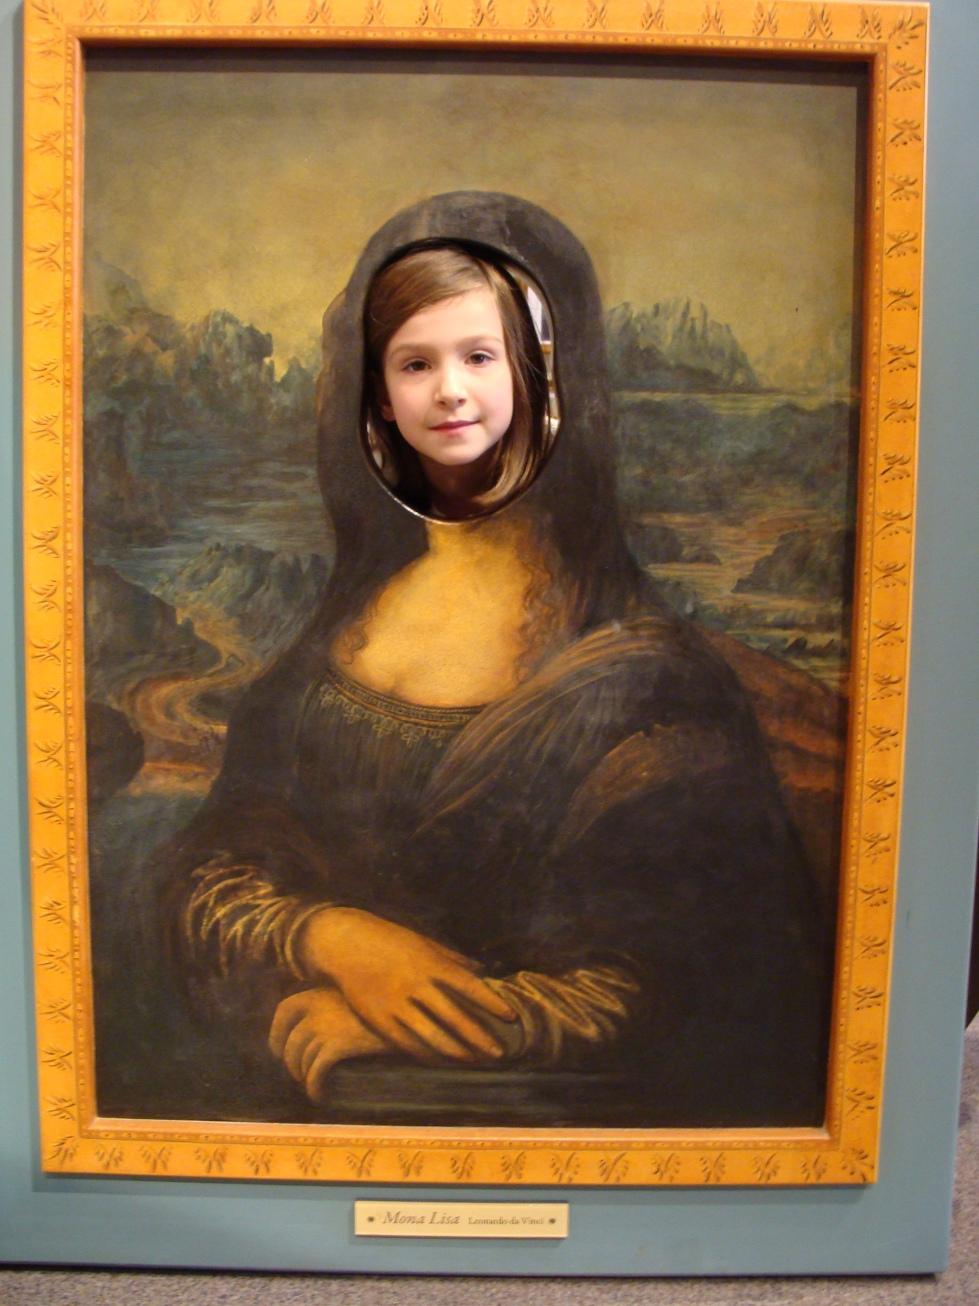 Mona Lisa Painting In Frame